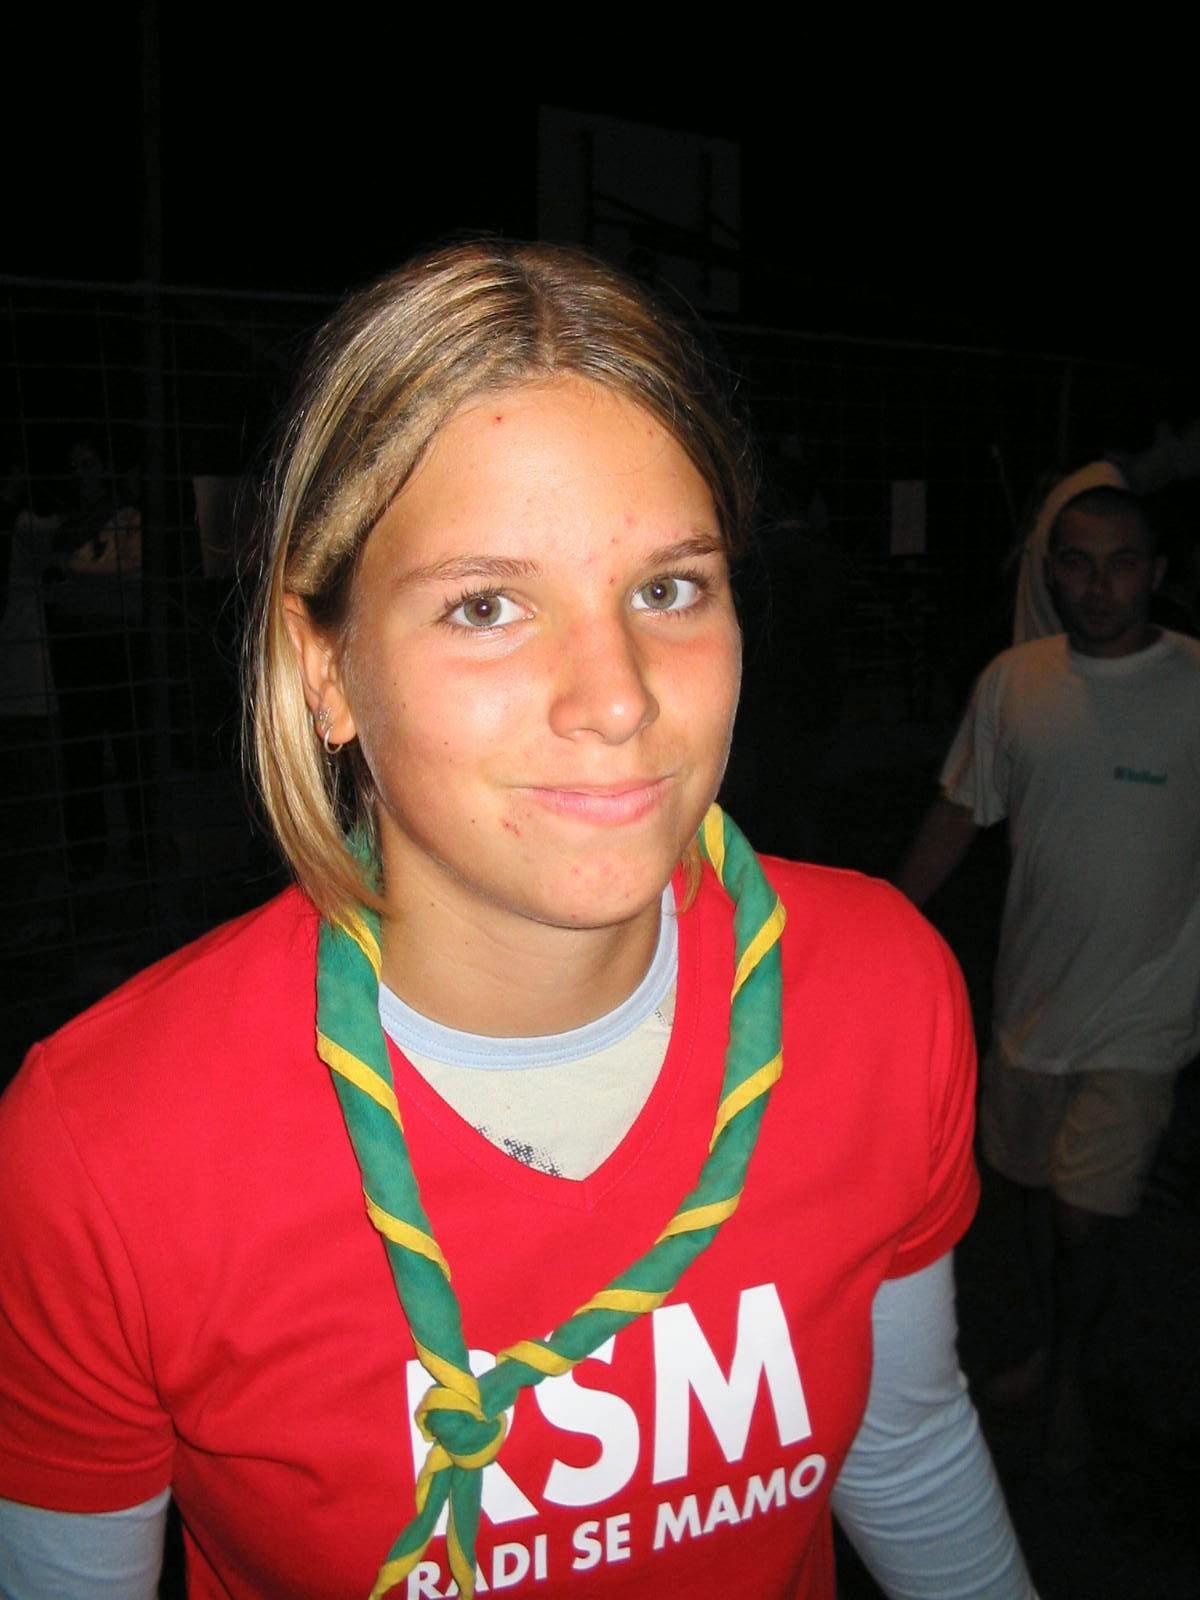 TOTeM, Ilirska Bistrica 2004 - 111_1143.JPG